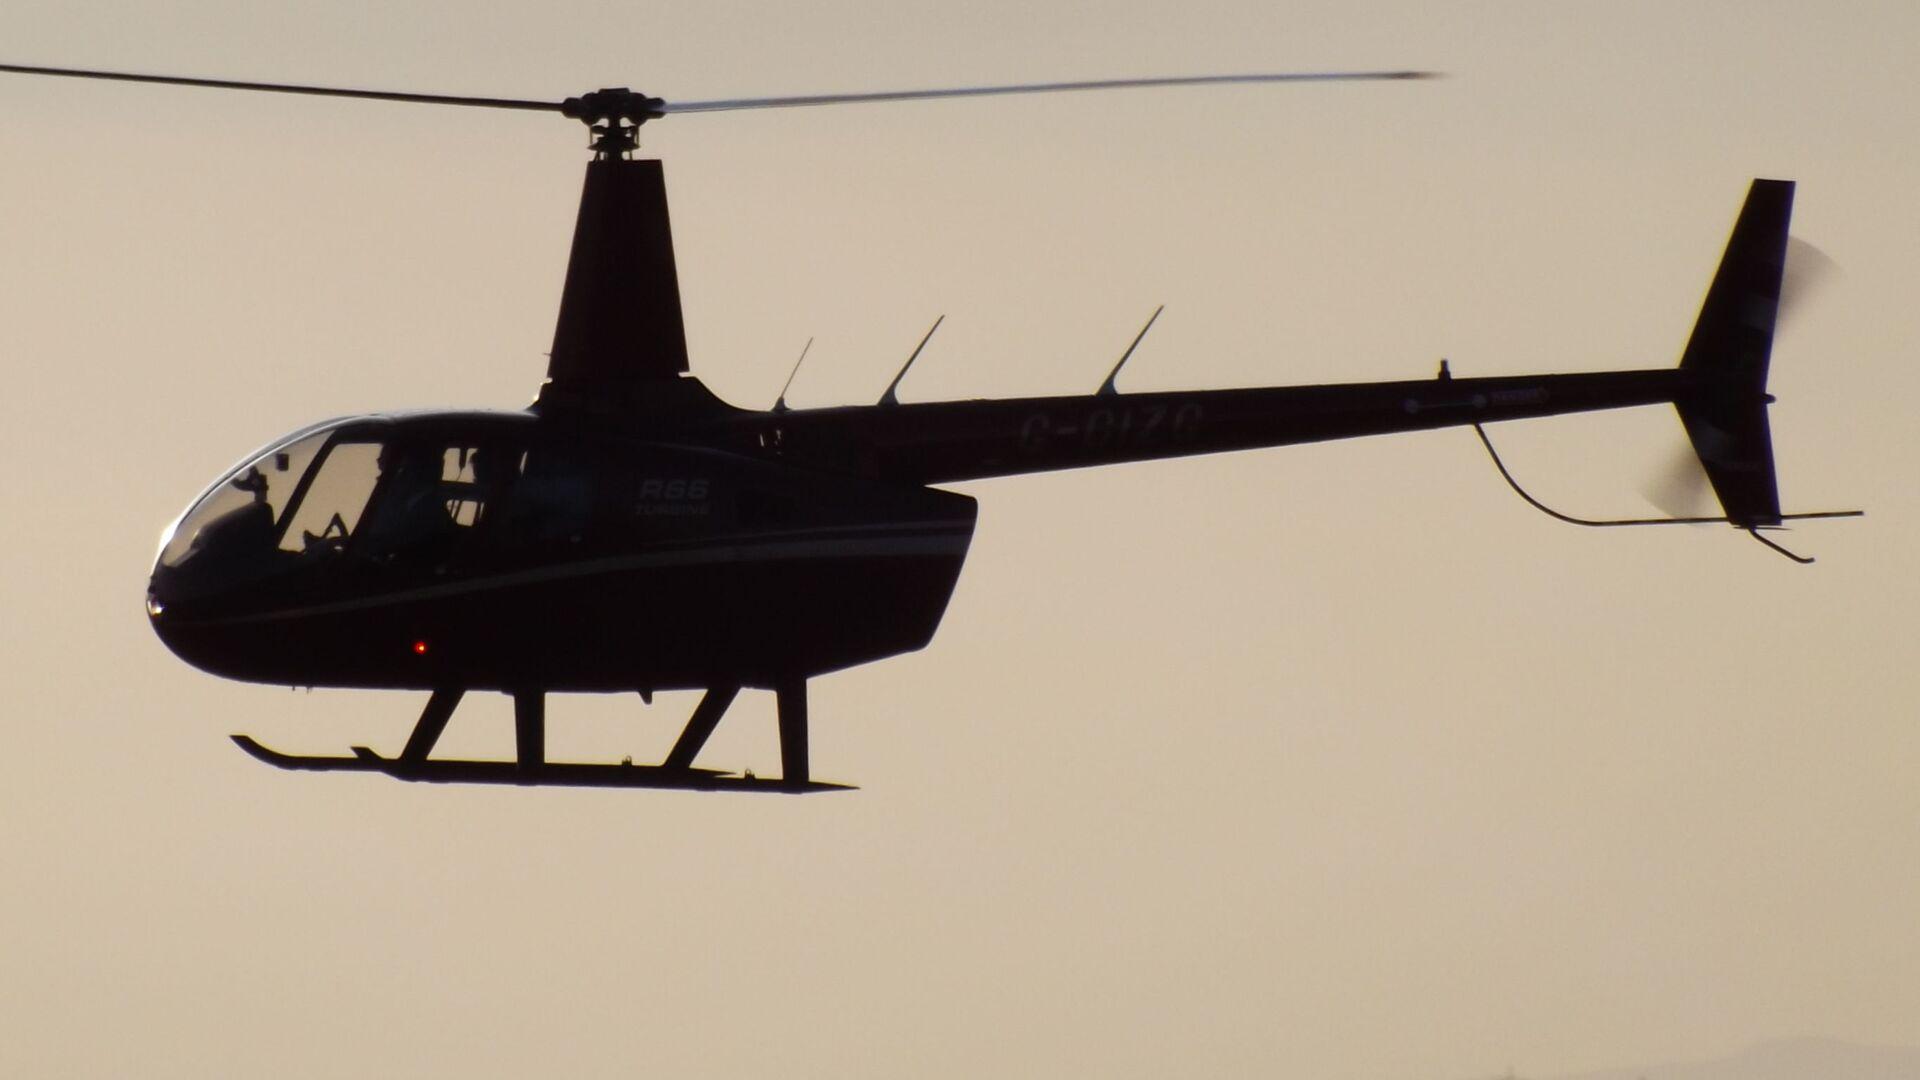 Helikopter model Robinson R66. - Sputnik Polska, 1920, 25.09.2021